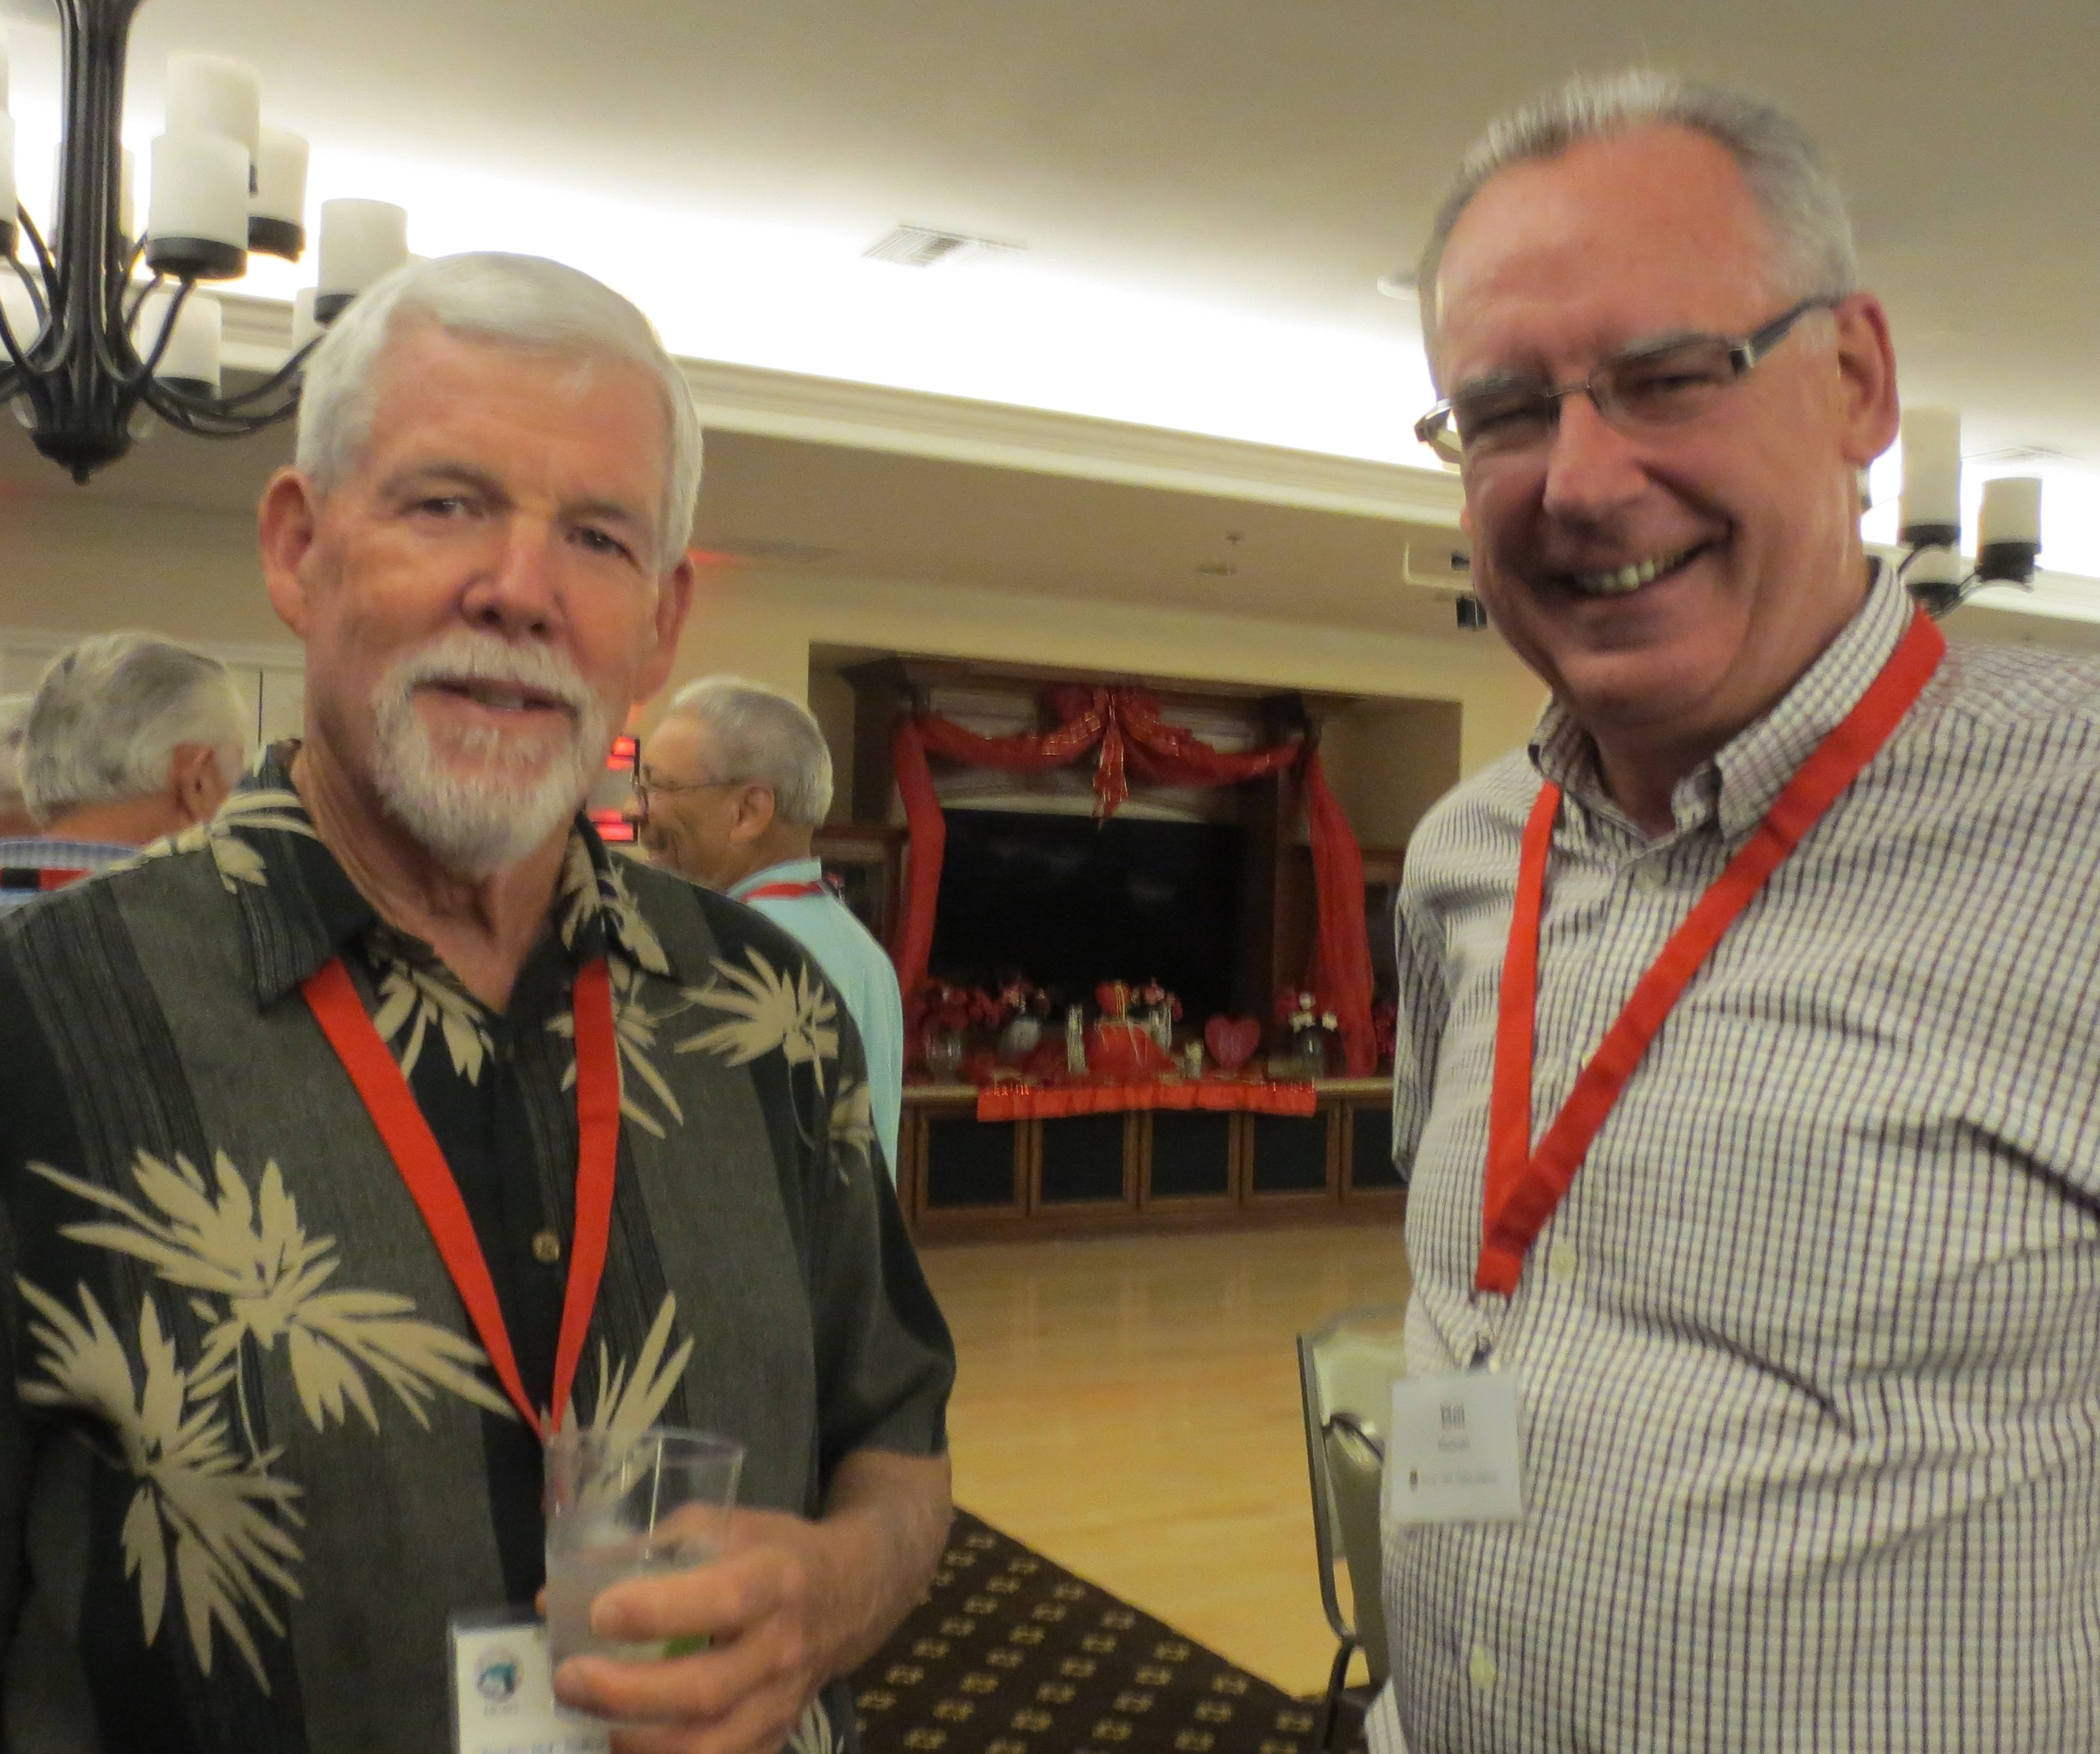 Bob Beard and Bill McGrath